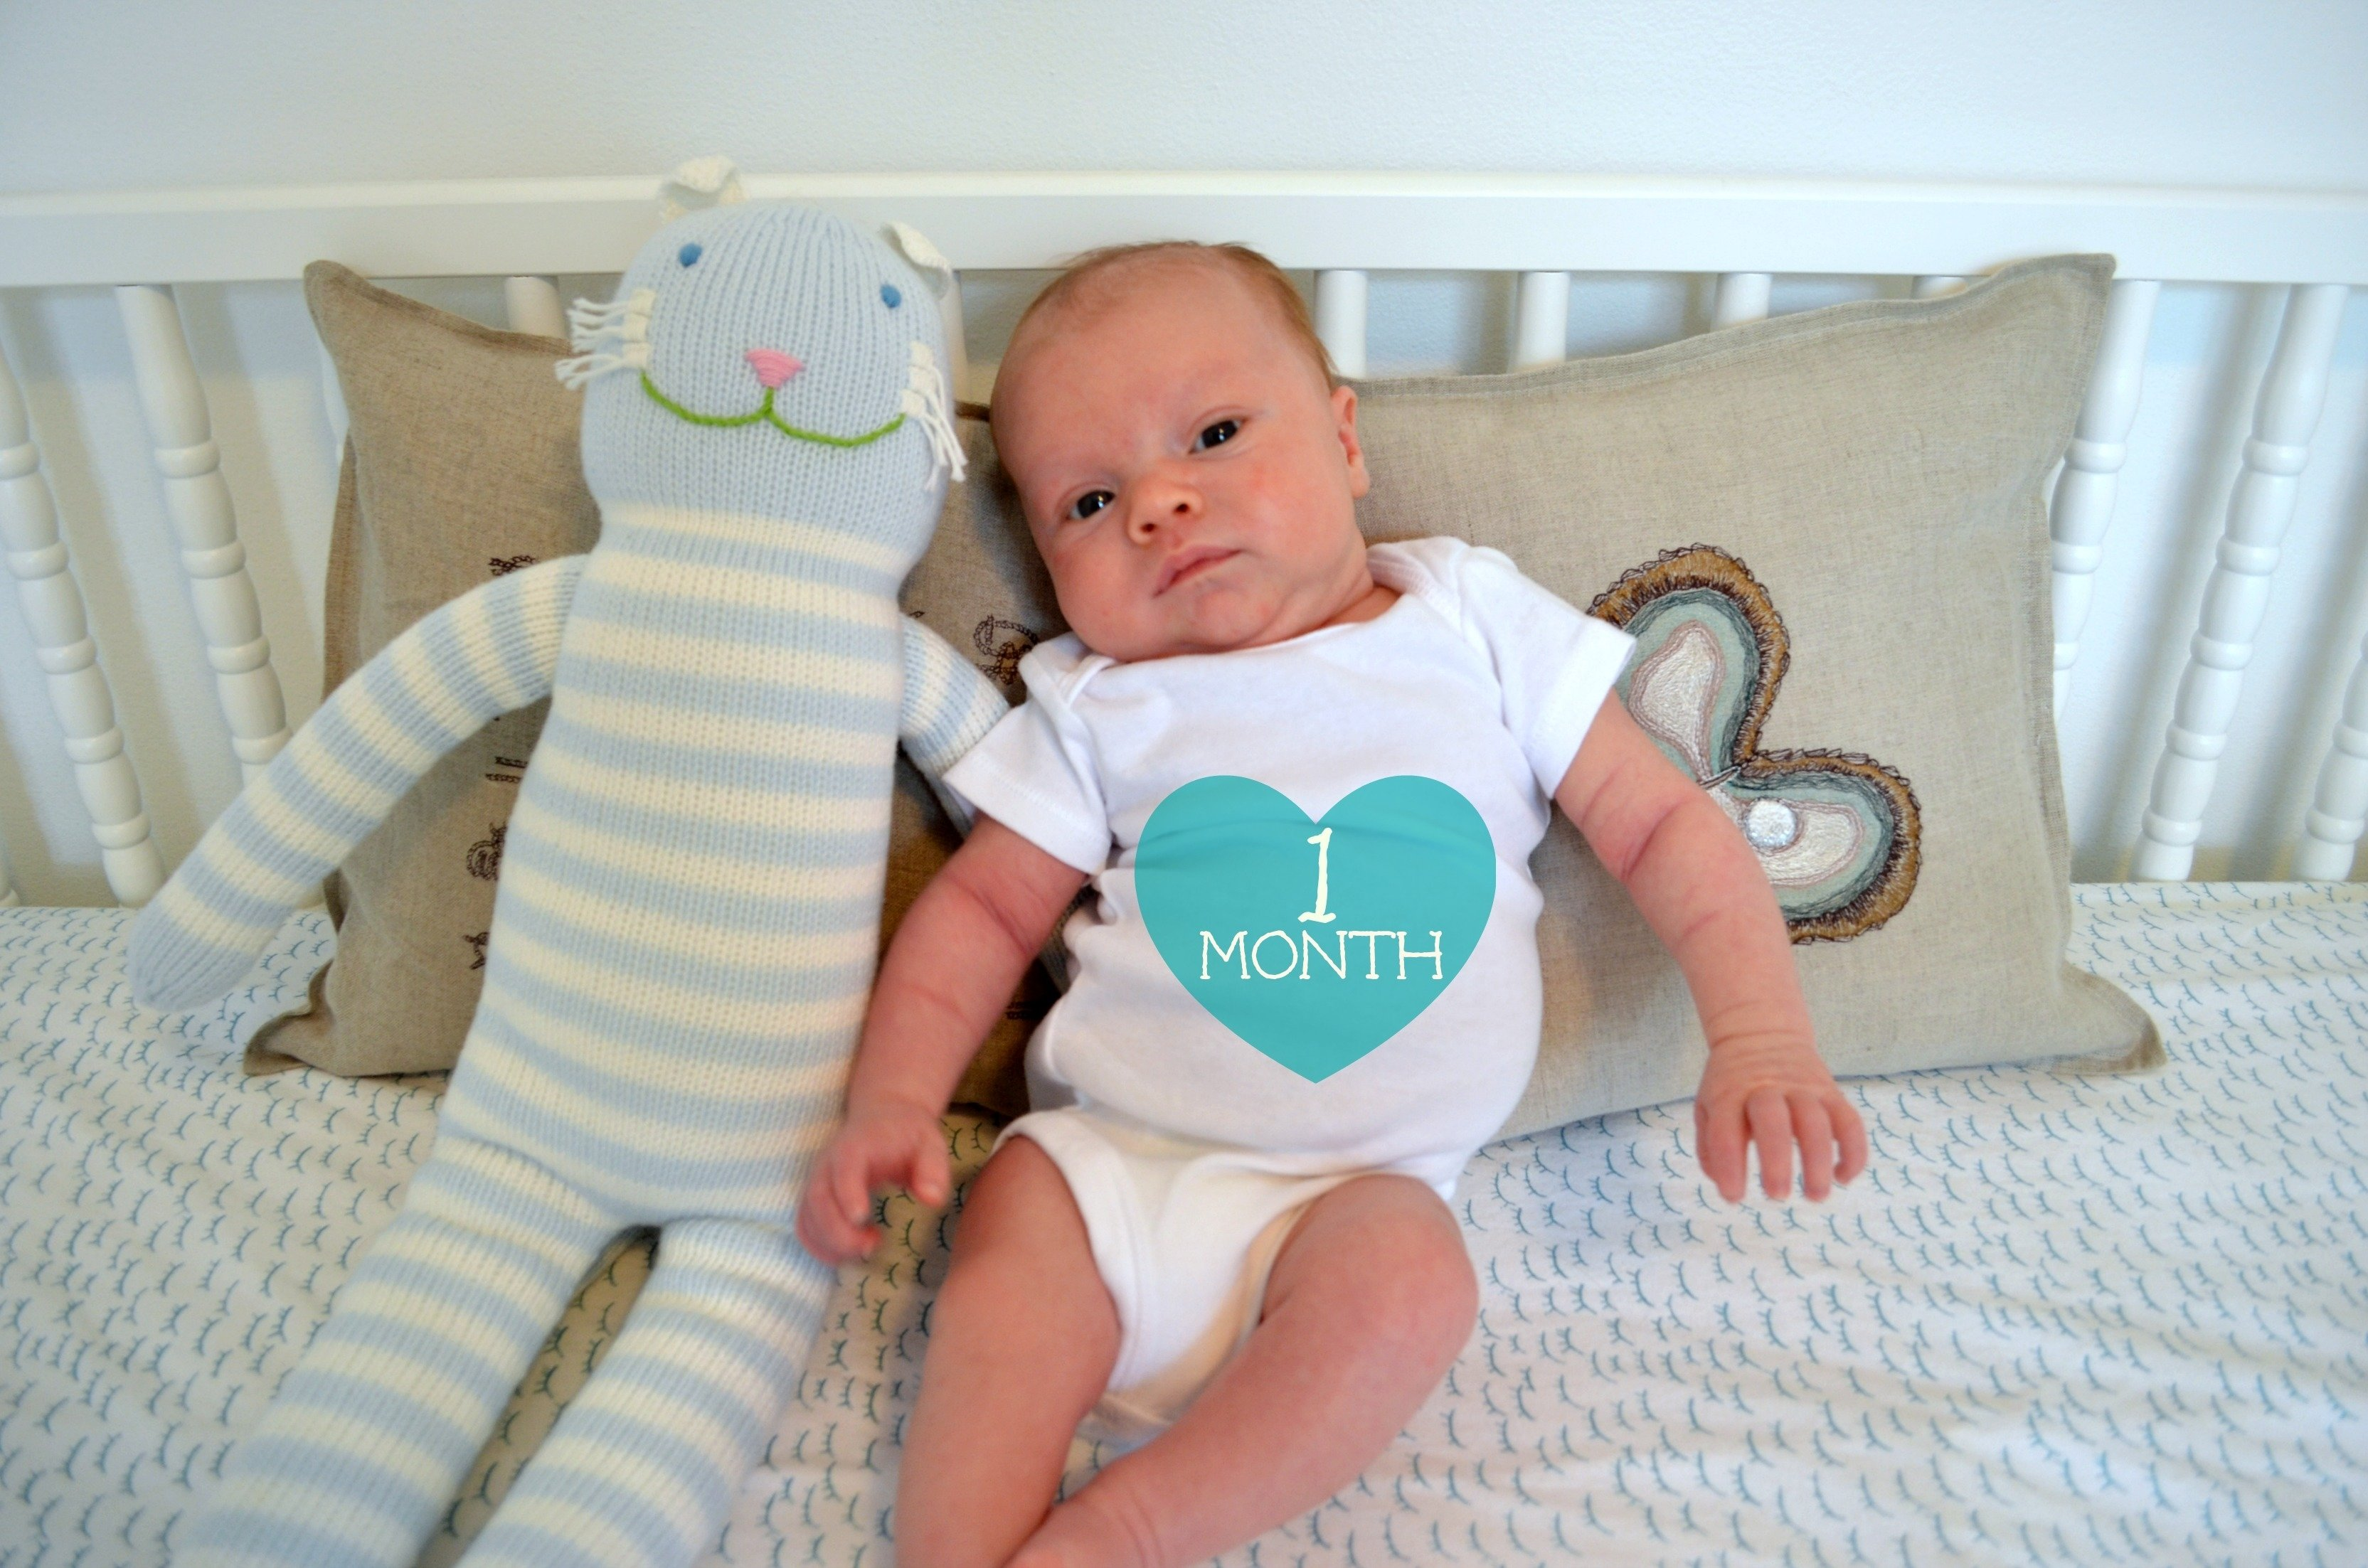 10 Unique 1 Month Baby Picture Ideas one month mother update blackbird ideas 1 2020